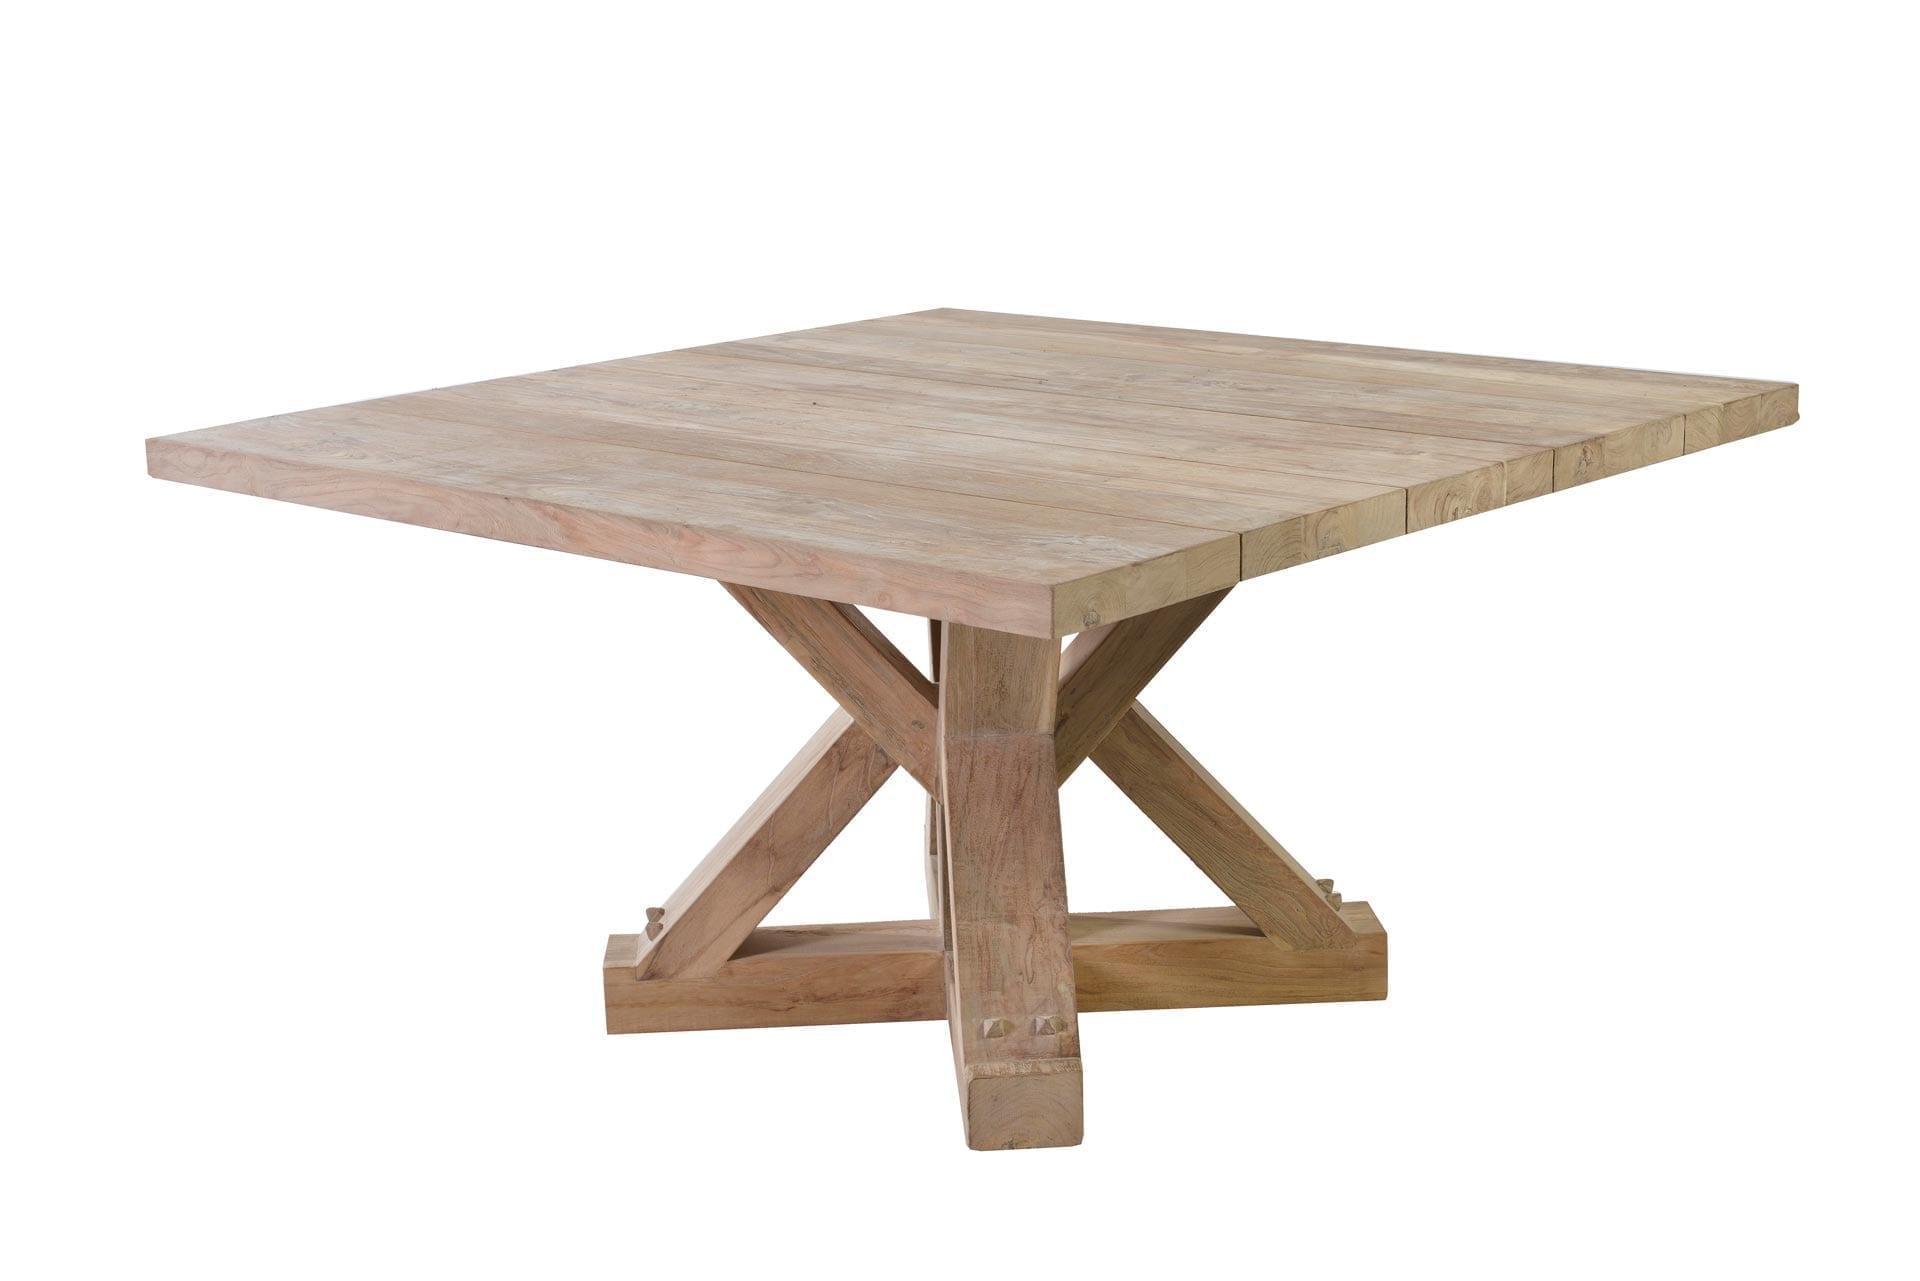 Jim tafel 140×140